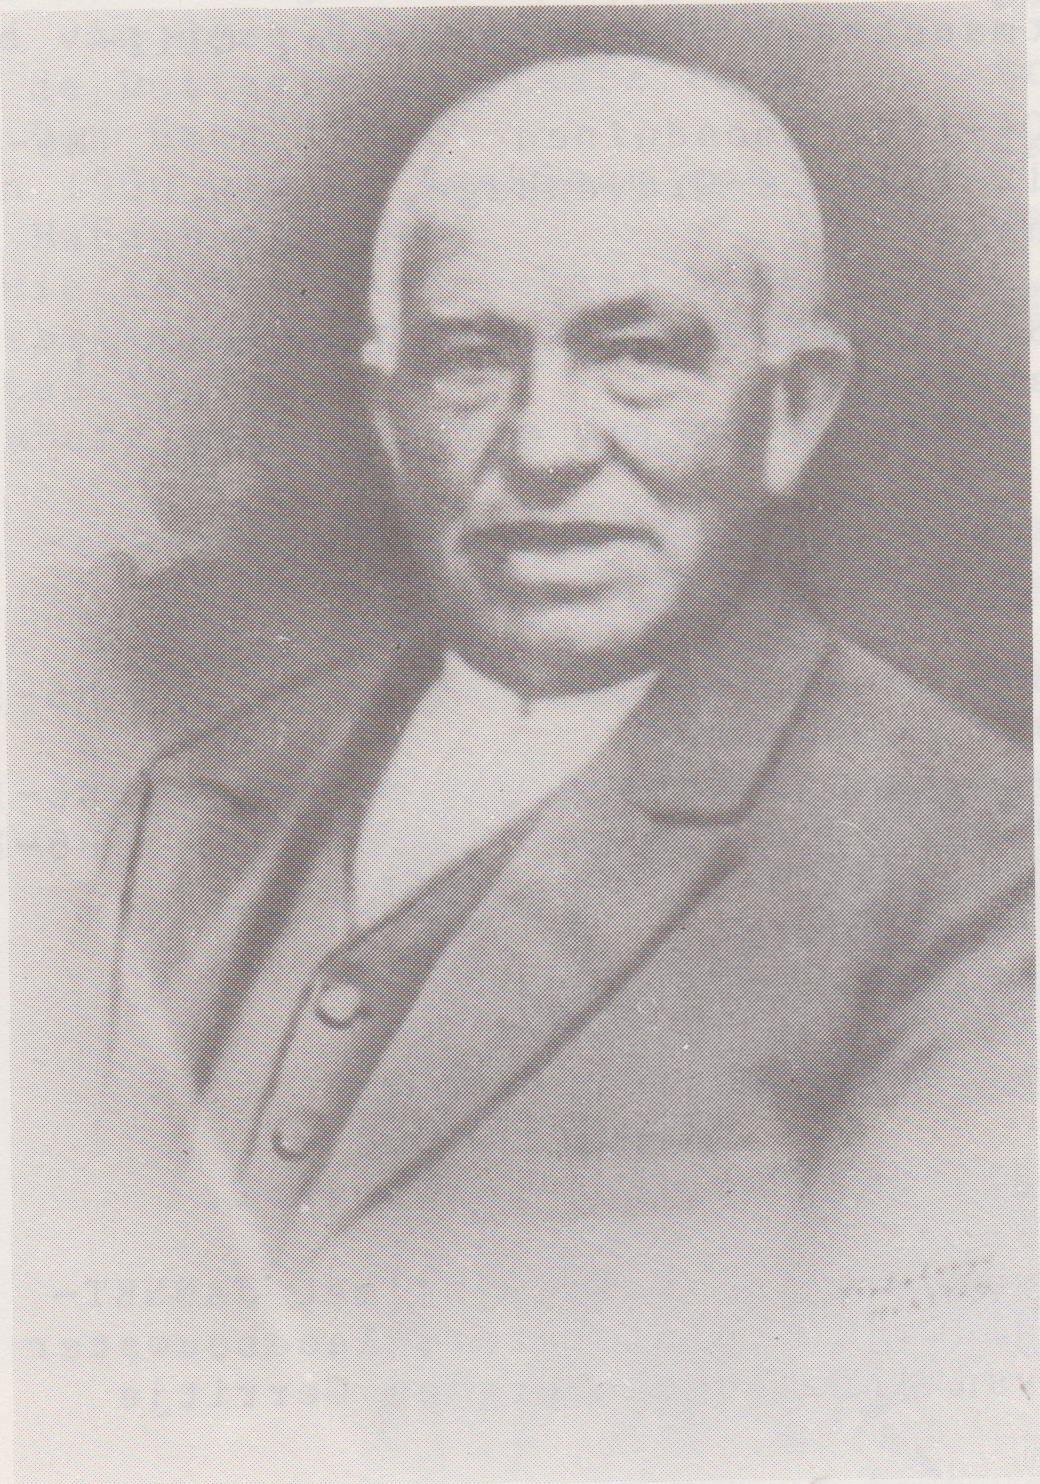 Cornelis Buitelaar 16-02-1861